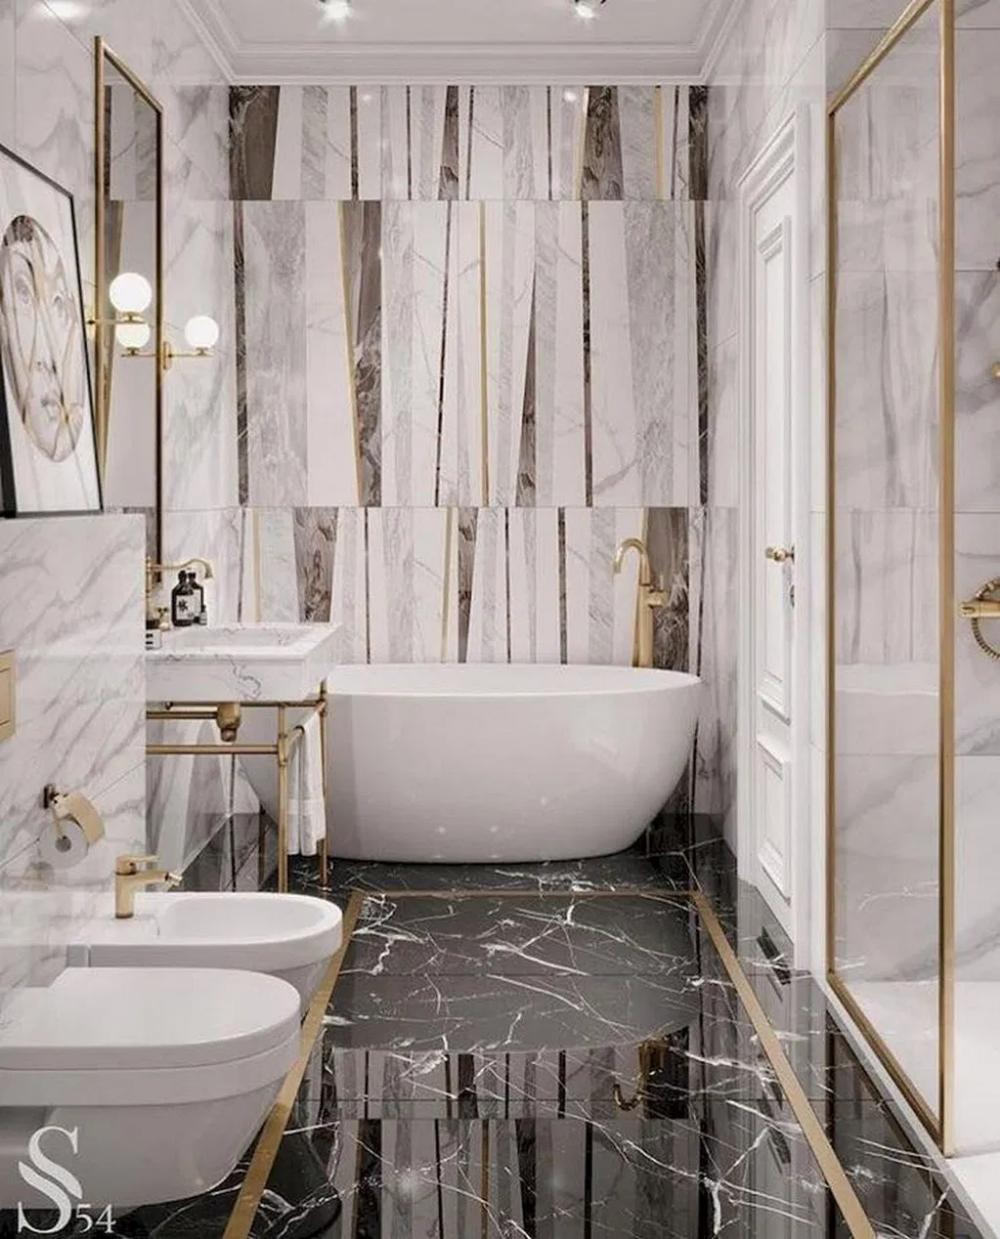 15 Stylish Bathroom Design Ideas That Can Be Applied To Your Home 6 Bathroomdesign Bedroo Bathroom Interior Design Bathroom Inspiration Decor Simple Bathroom